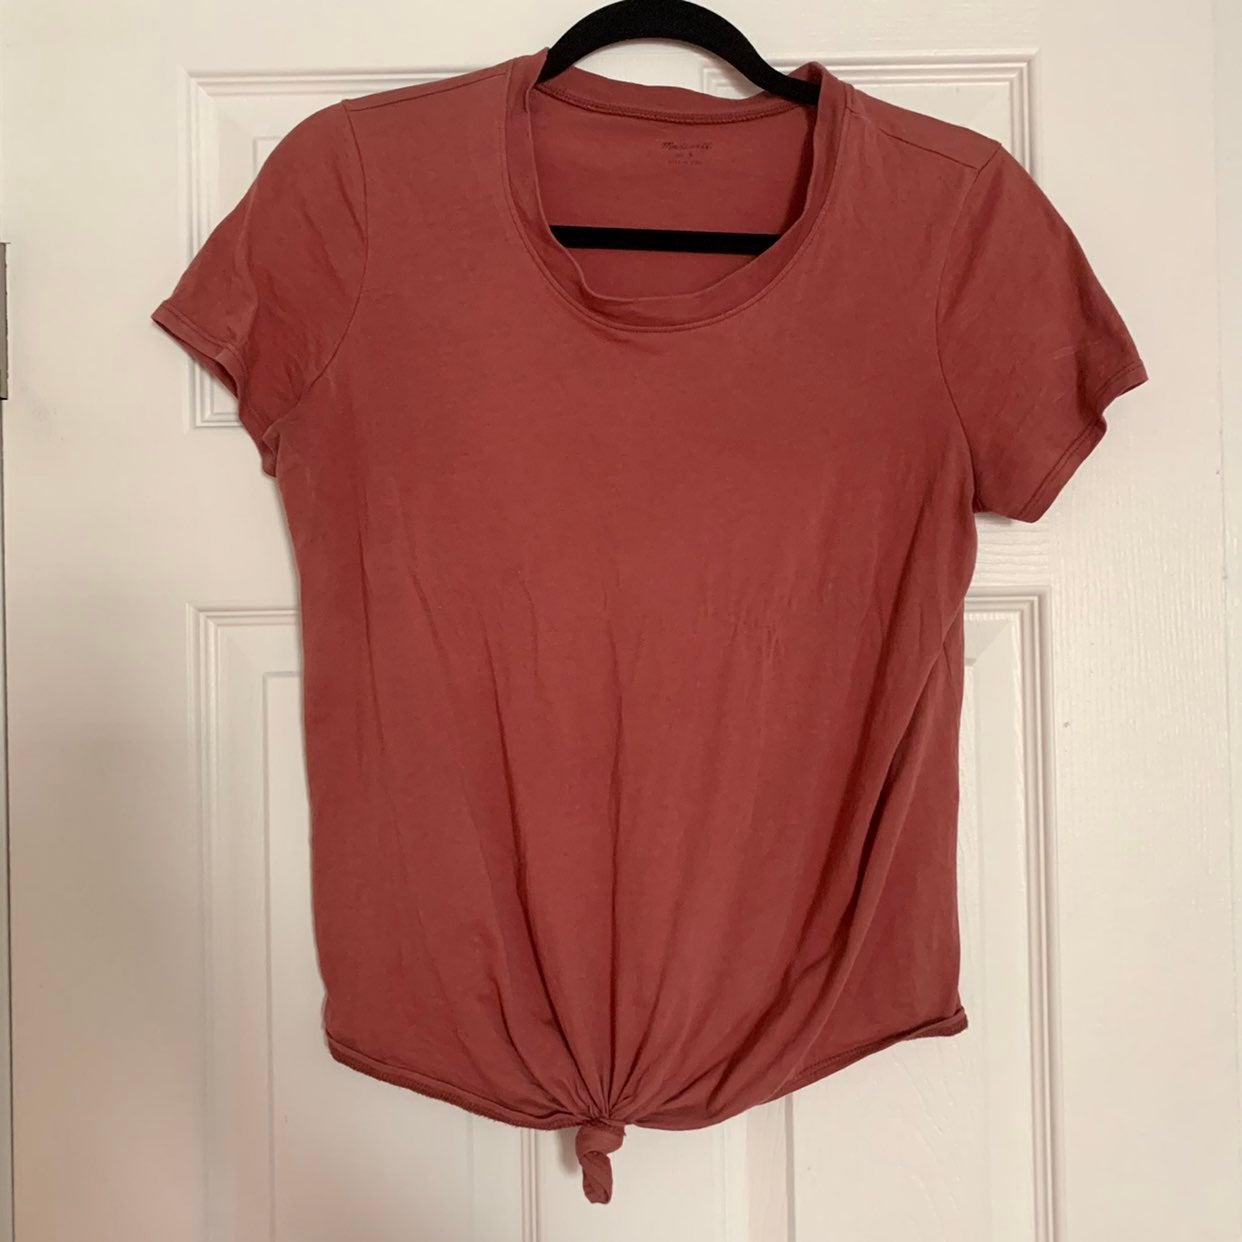 Madewell Pink Cotton T-shirt S